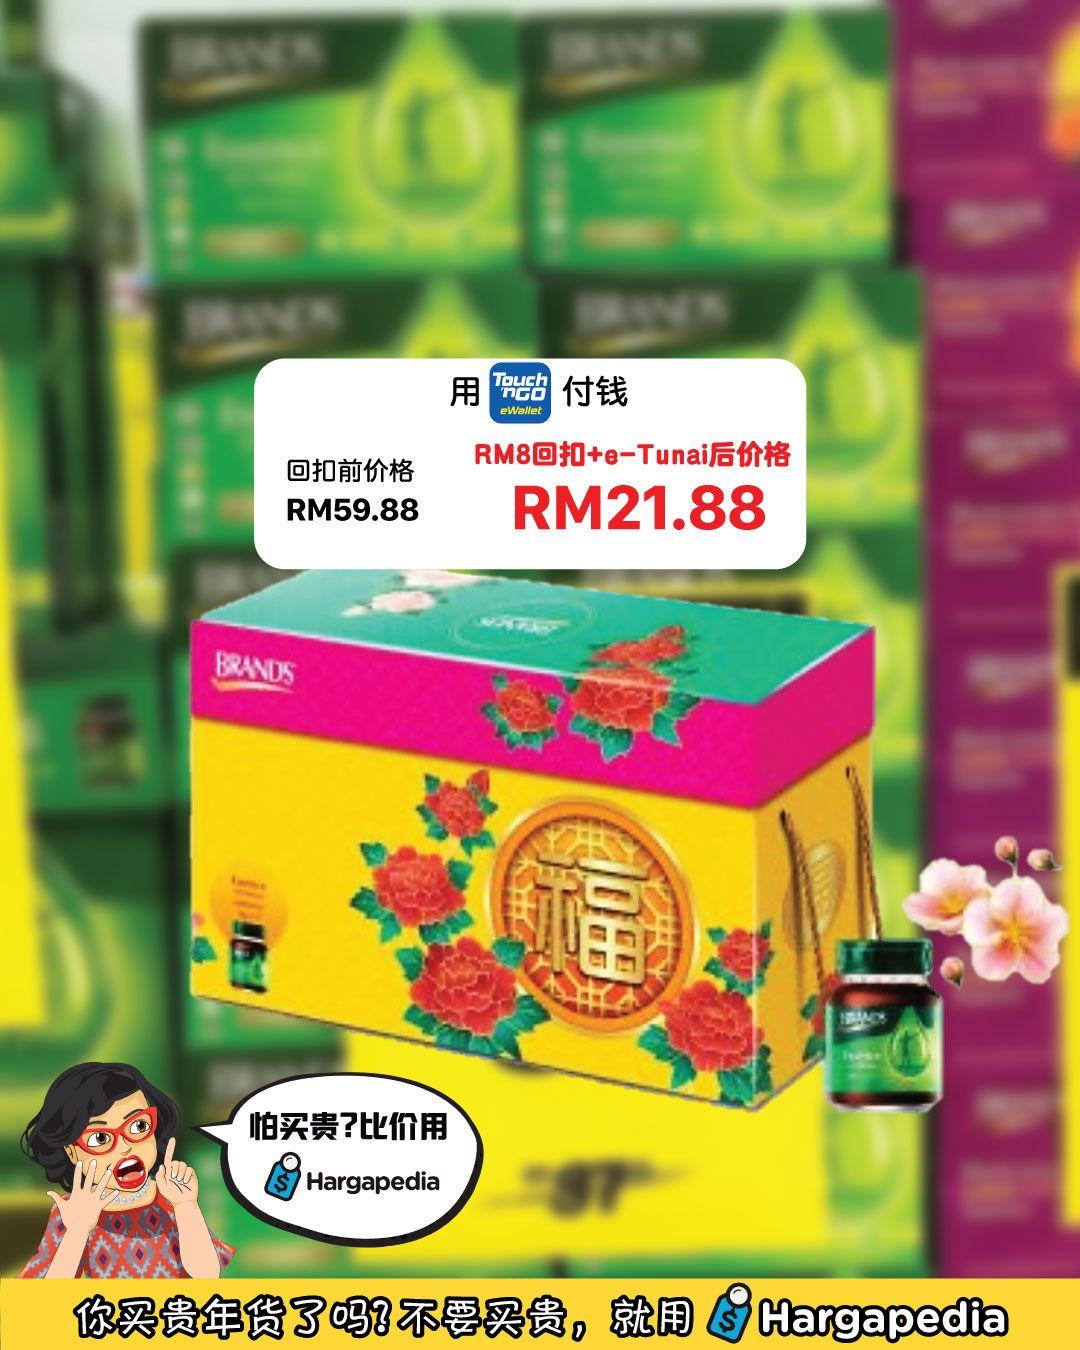 99SM-Brand-s-Essence-of-Chicken-CNY